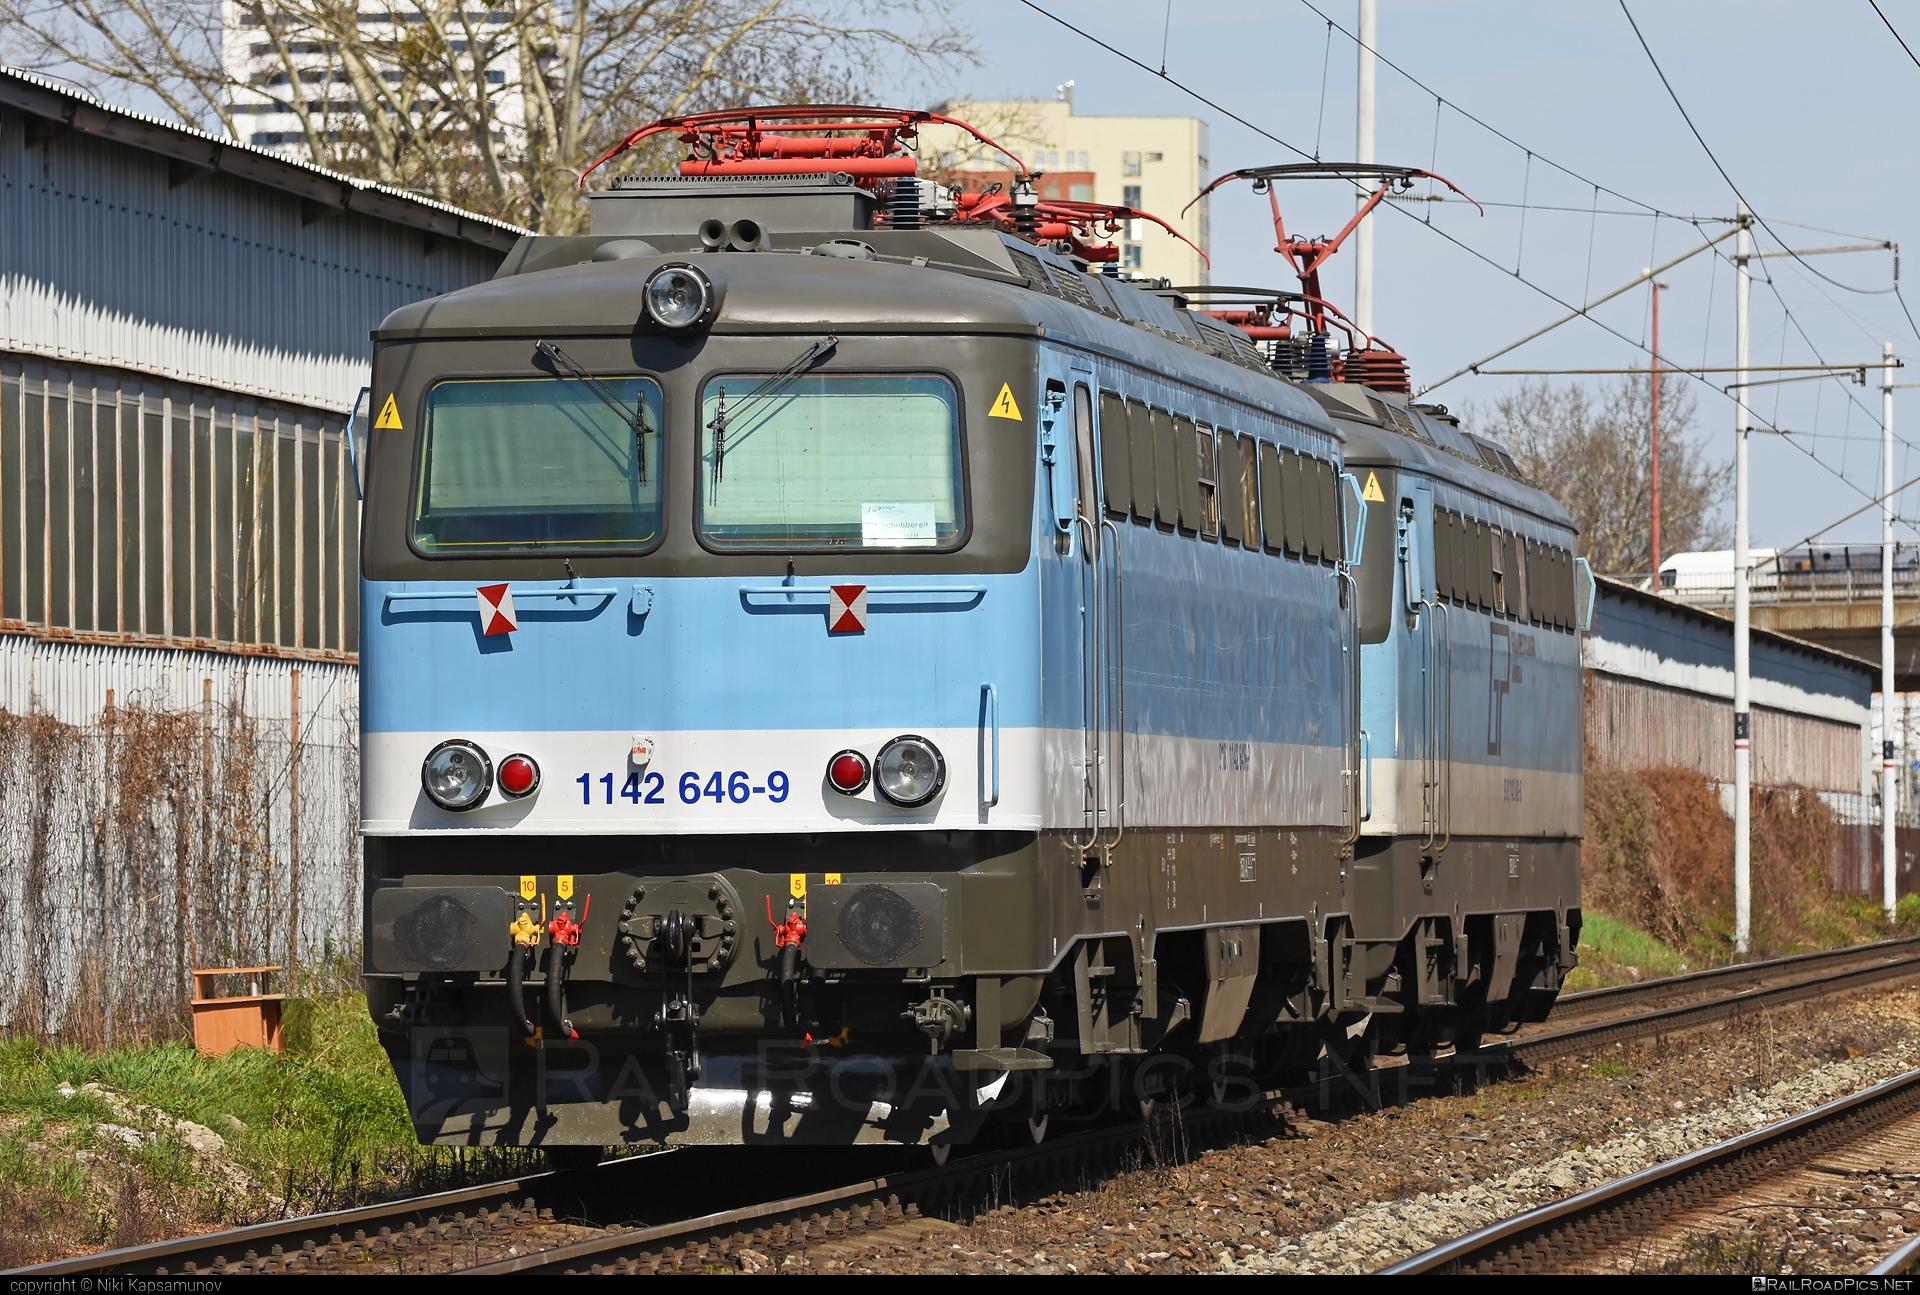 SGP ÖBB Class 1142 - 1142 646-9 operated by Grampetcargo Austria #GrampetcargoAustria #grampetcargo #obbclass1142 #sgp #sgp1142 #simmeringgrazpauker